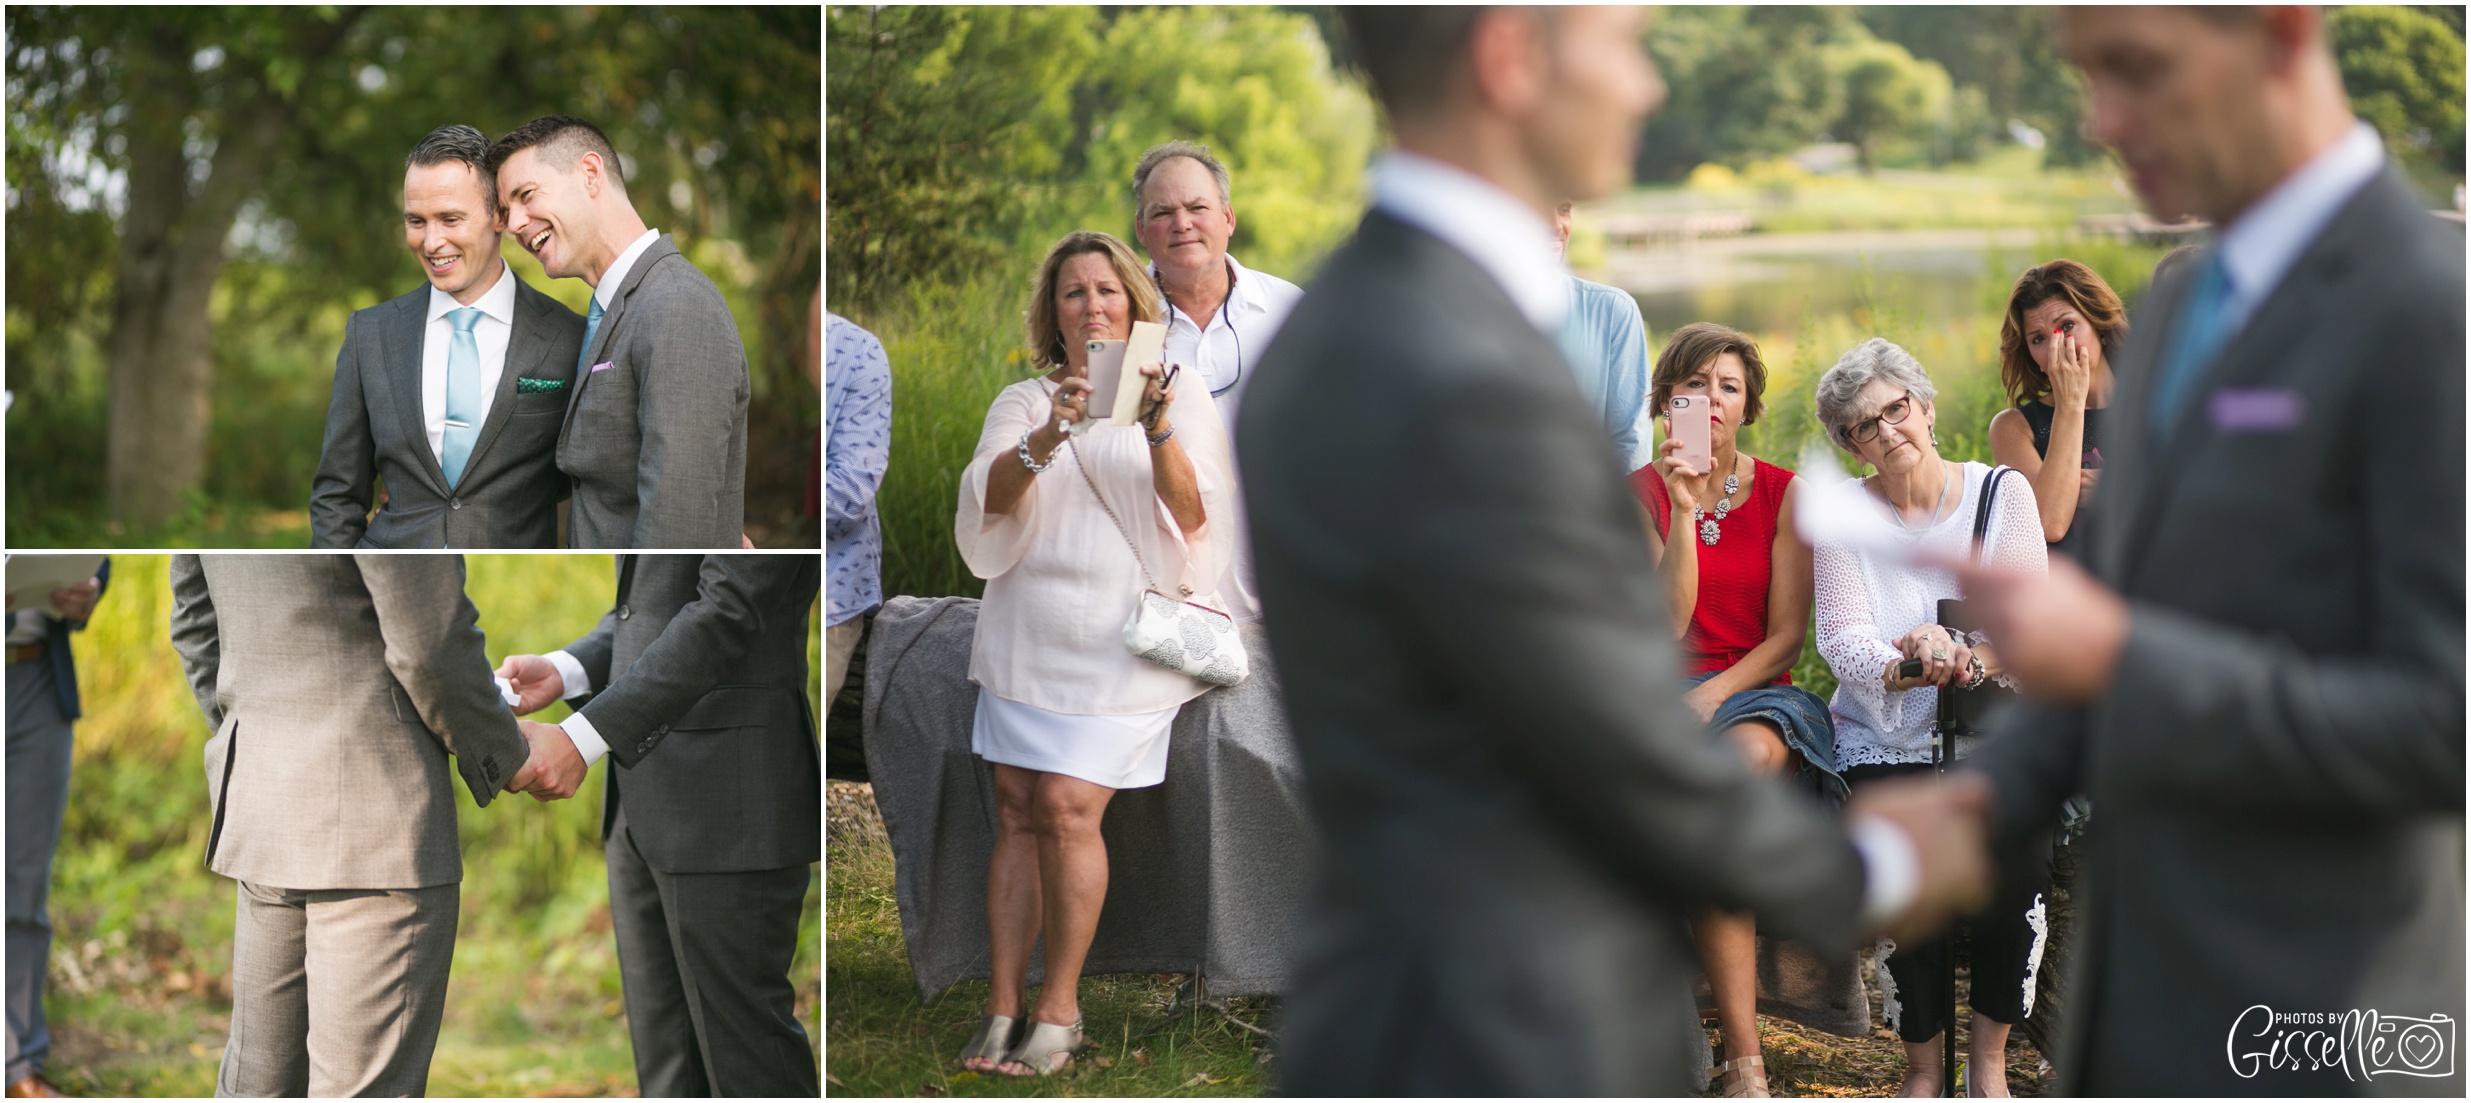 Lincoln Park Wedding_0008.jpg